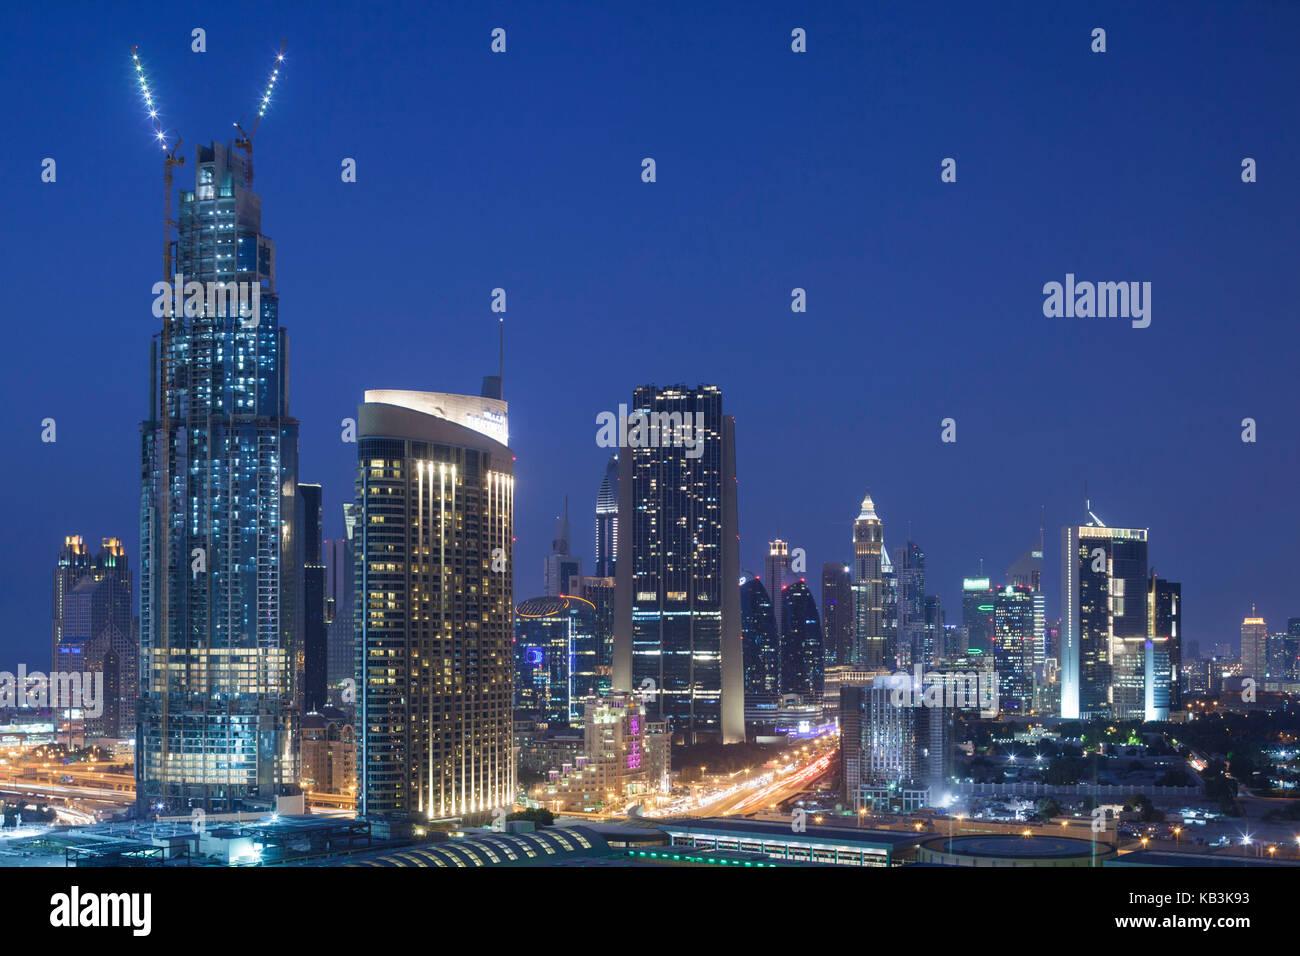 UAE, Dubai, Downtown Dubai, Downtown hi rise buildings, elevated view - Stock Image